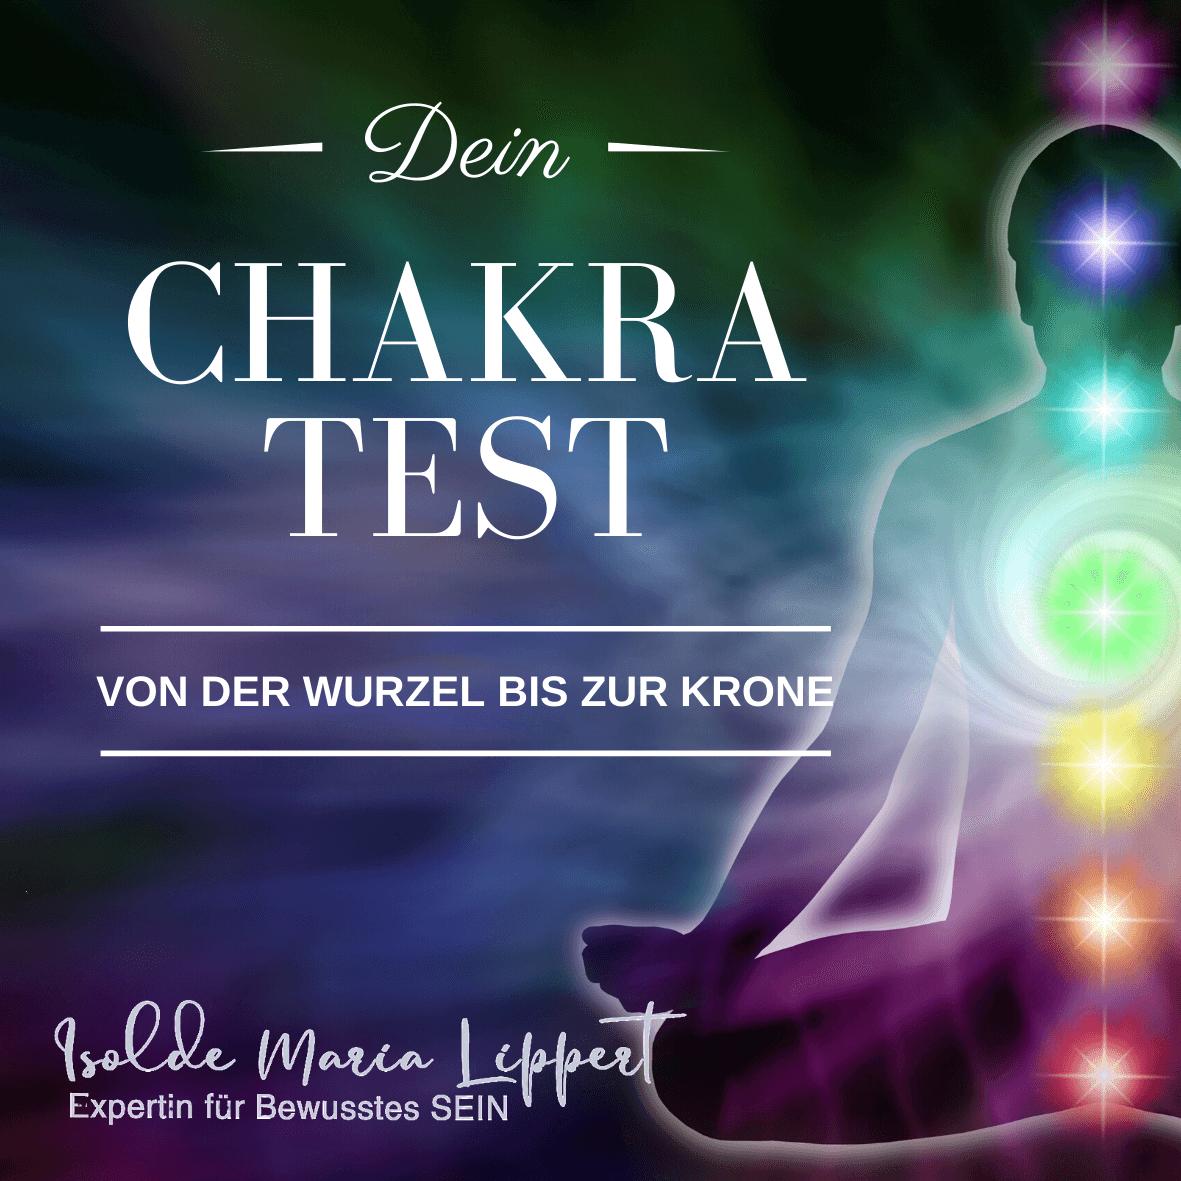 Lippert-Isolde-Maria_CHAKRA-TEST--Thumbnail